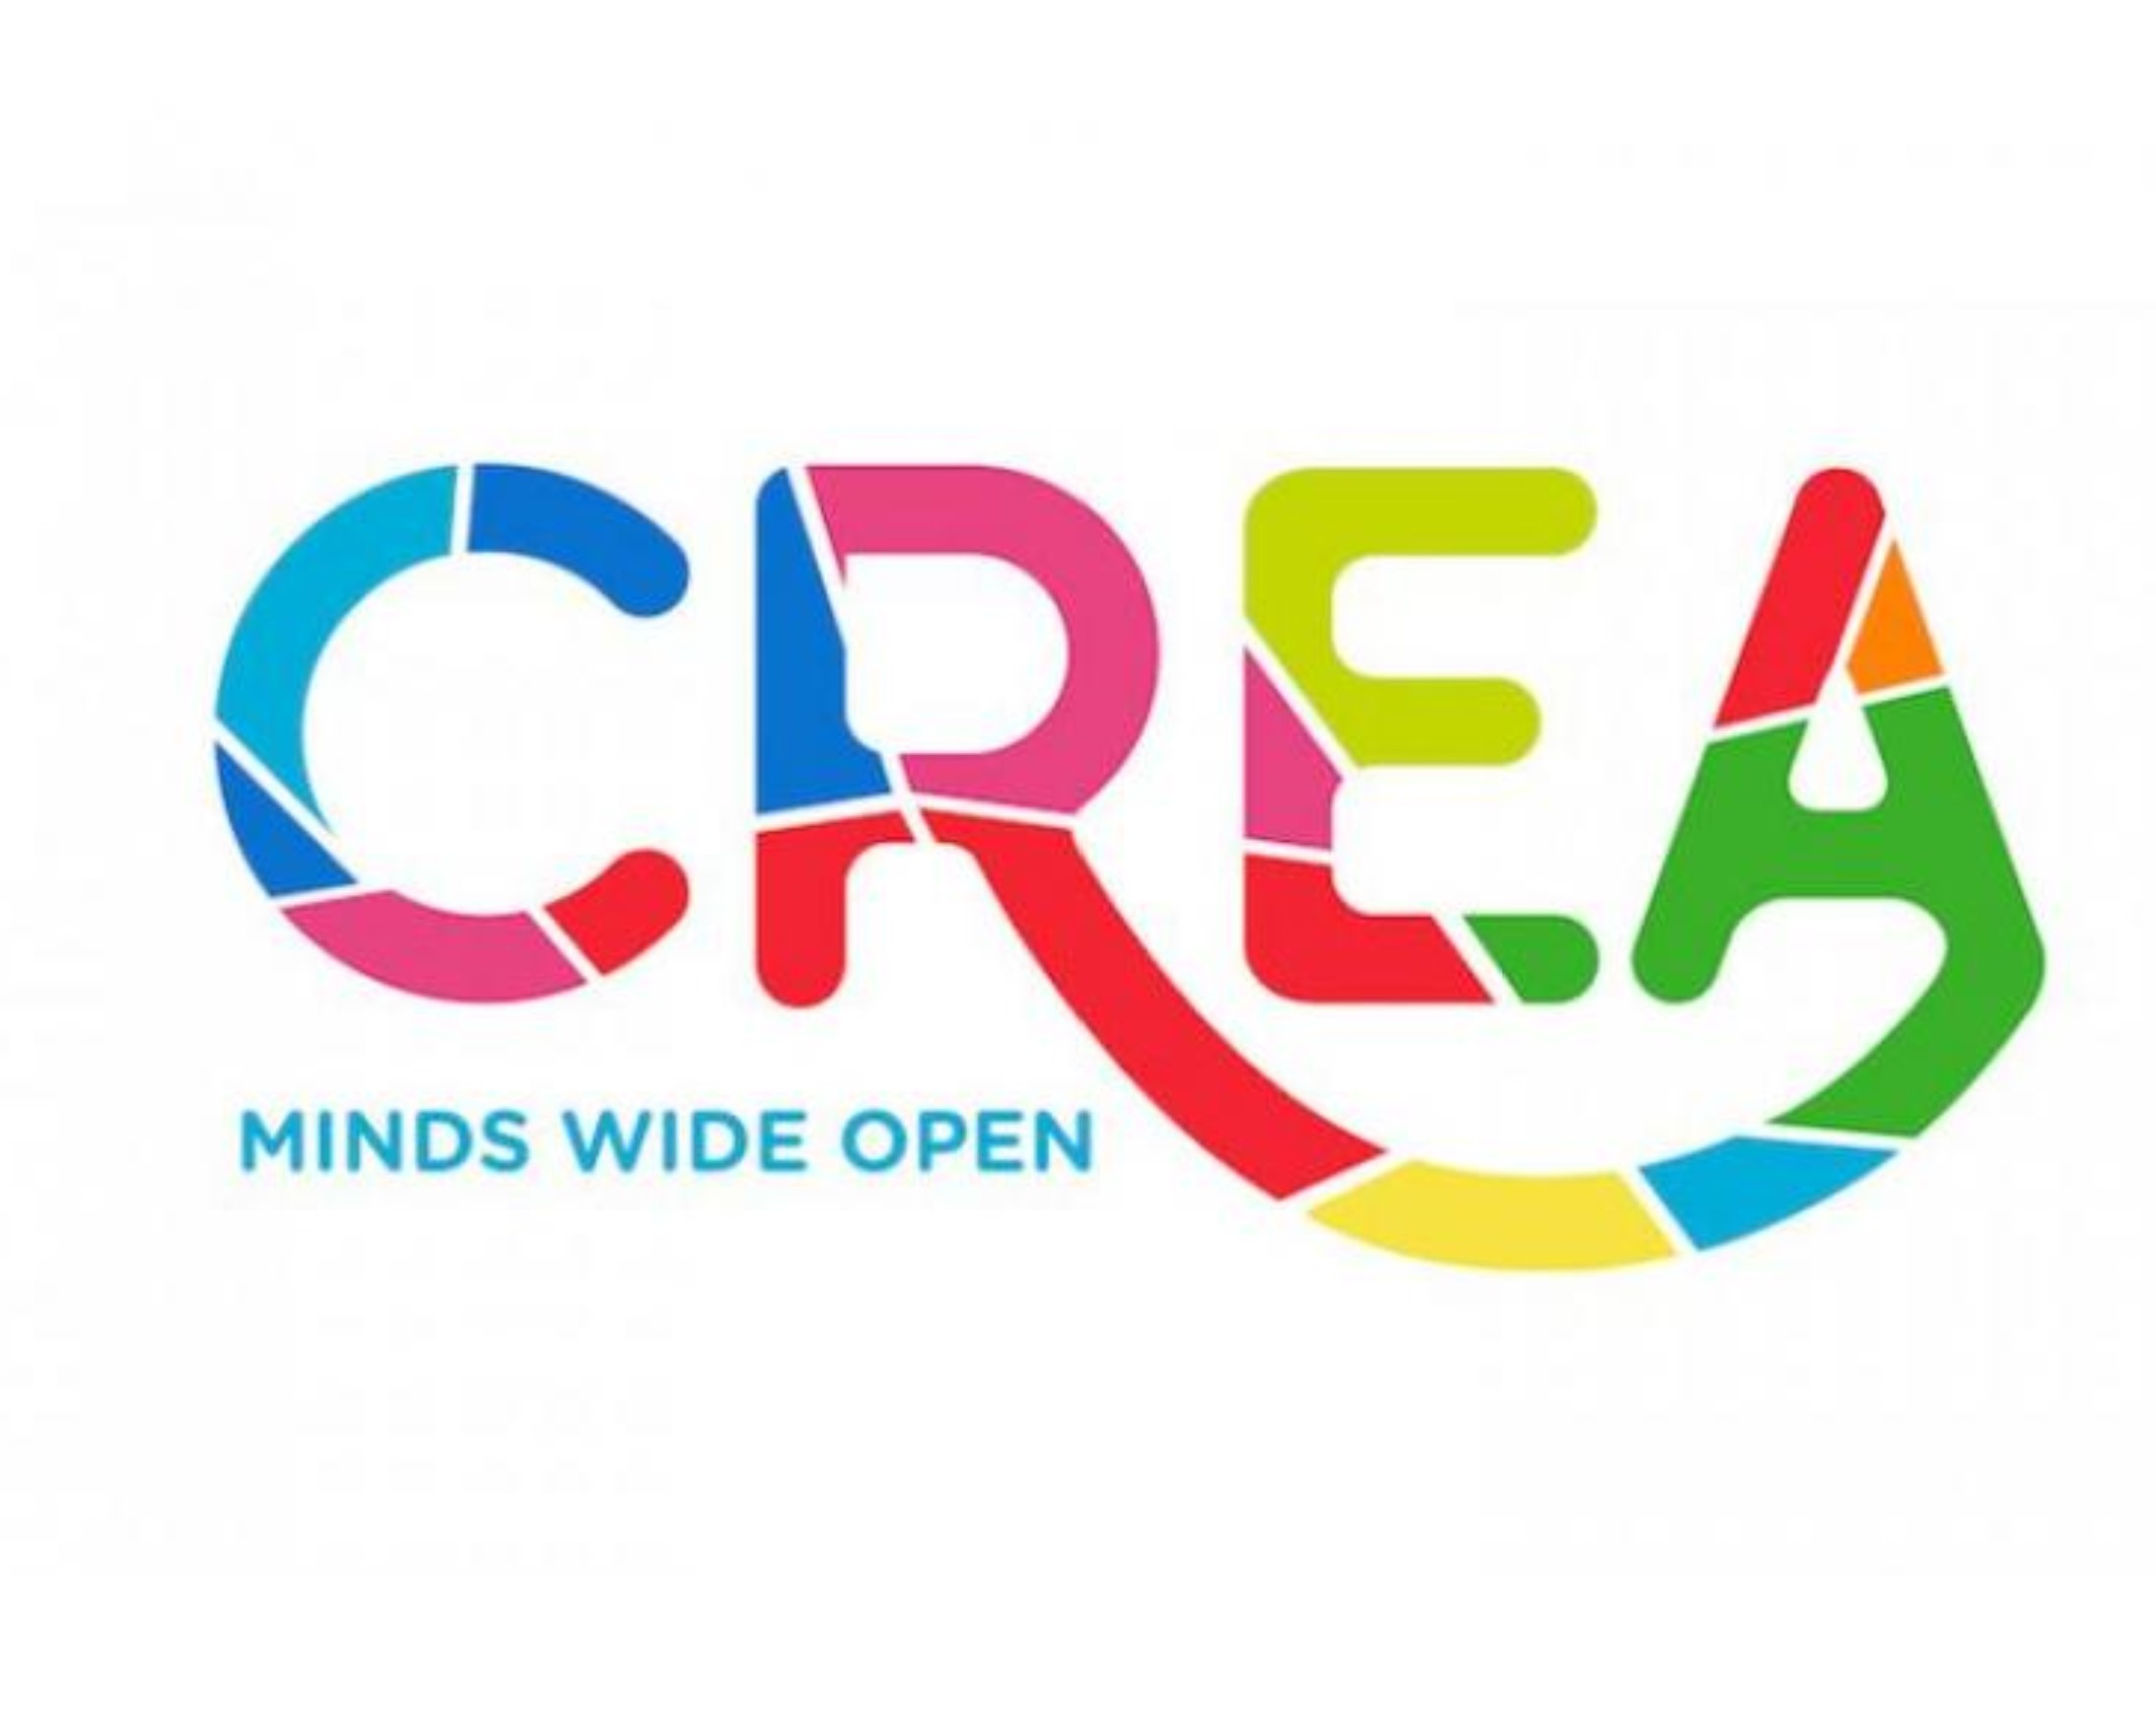 CREA Nicaragua